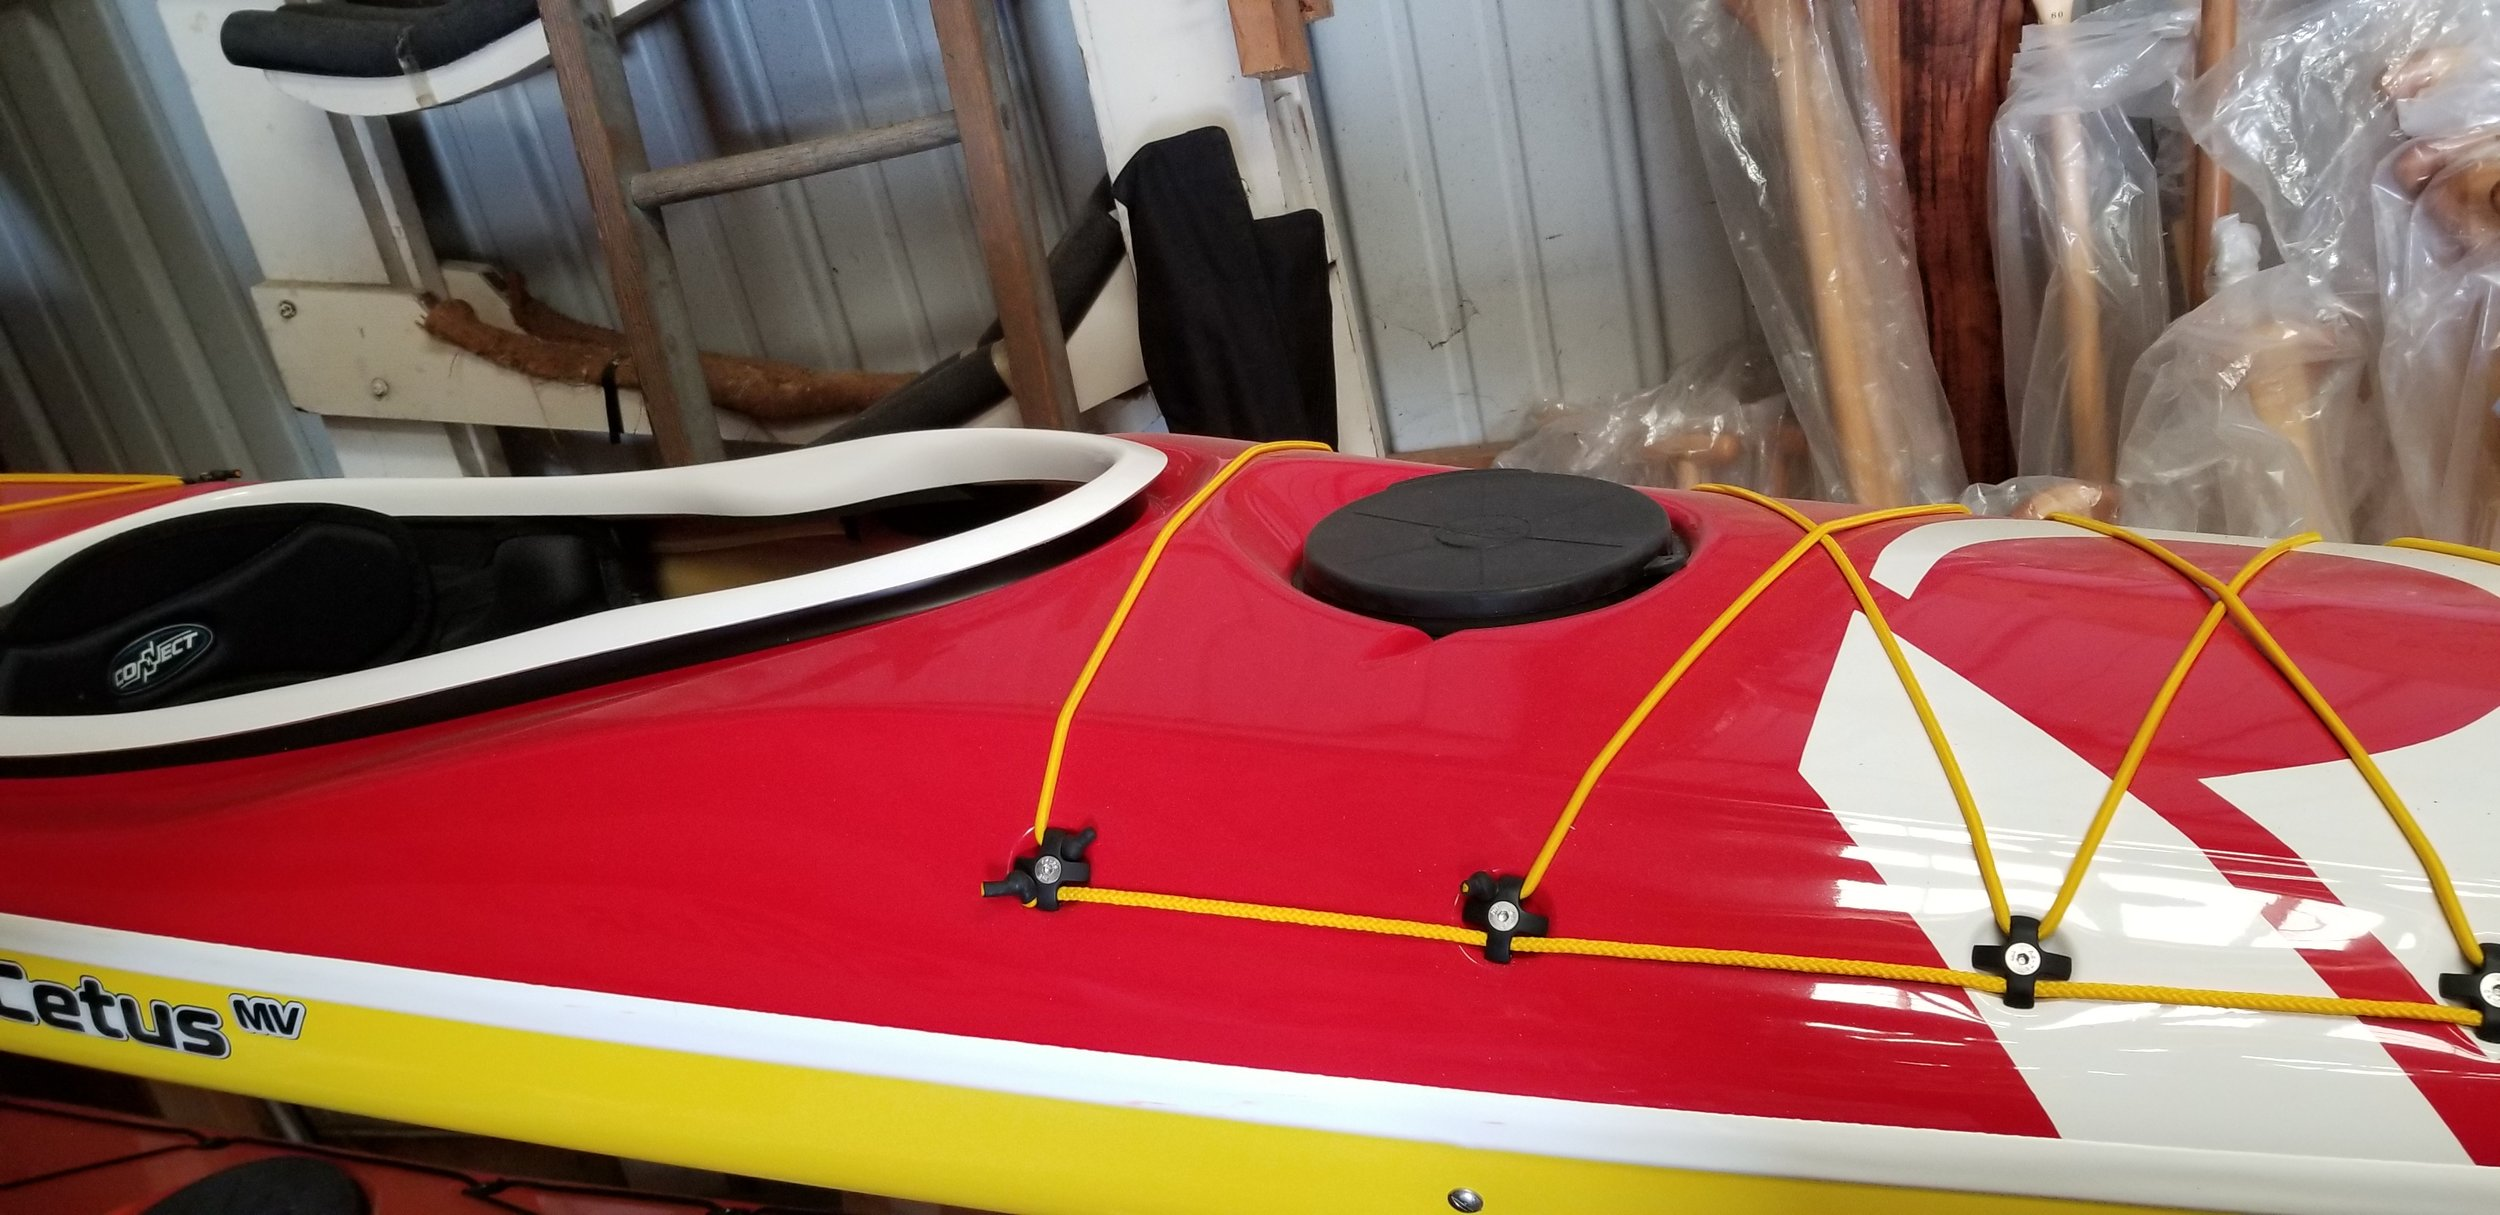 Standard Layup.  Red Deck, yellow hull, white combing, seam and logo.  2018